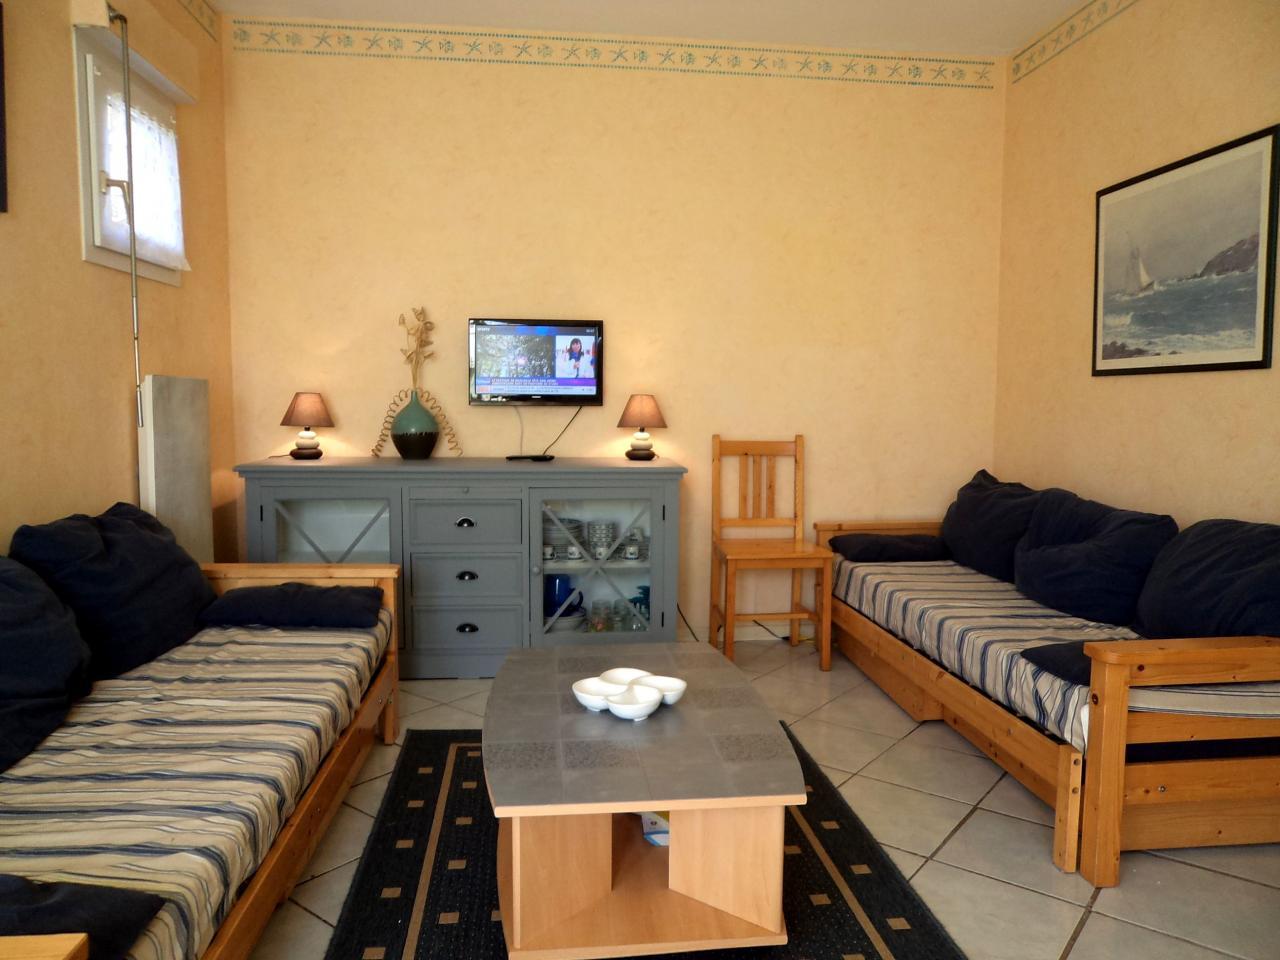 Magasin Salle De Bains Biarritz ~ Annonce N 3017 Appartement Dans R Sidence Biarritz Biarritz